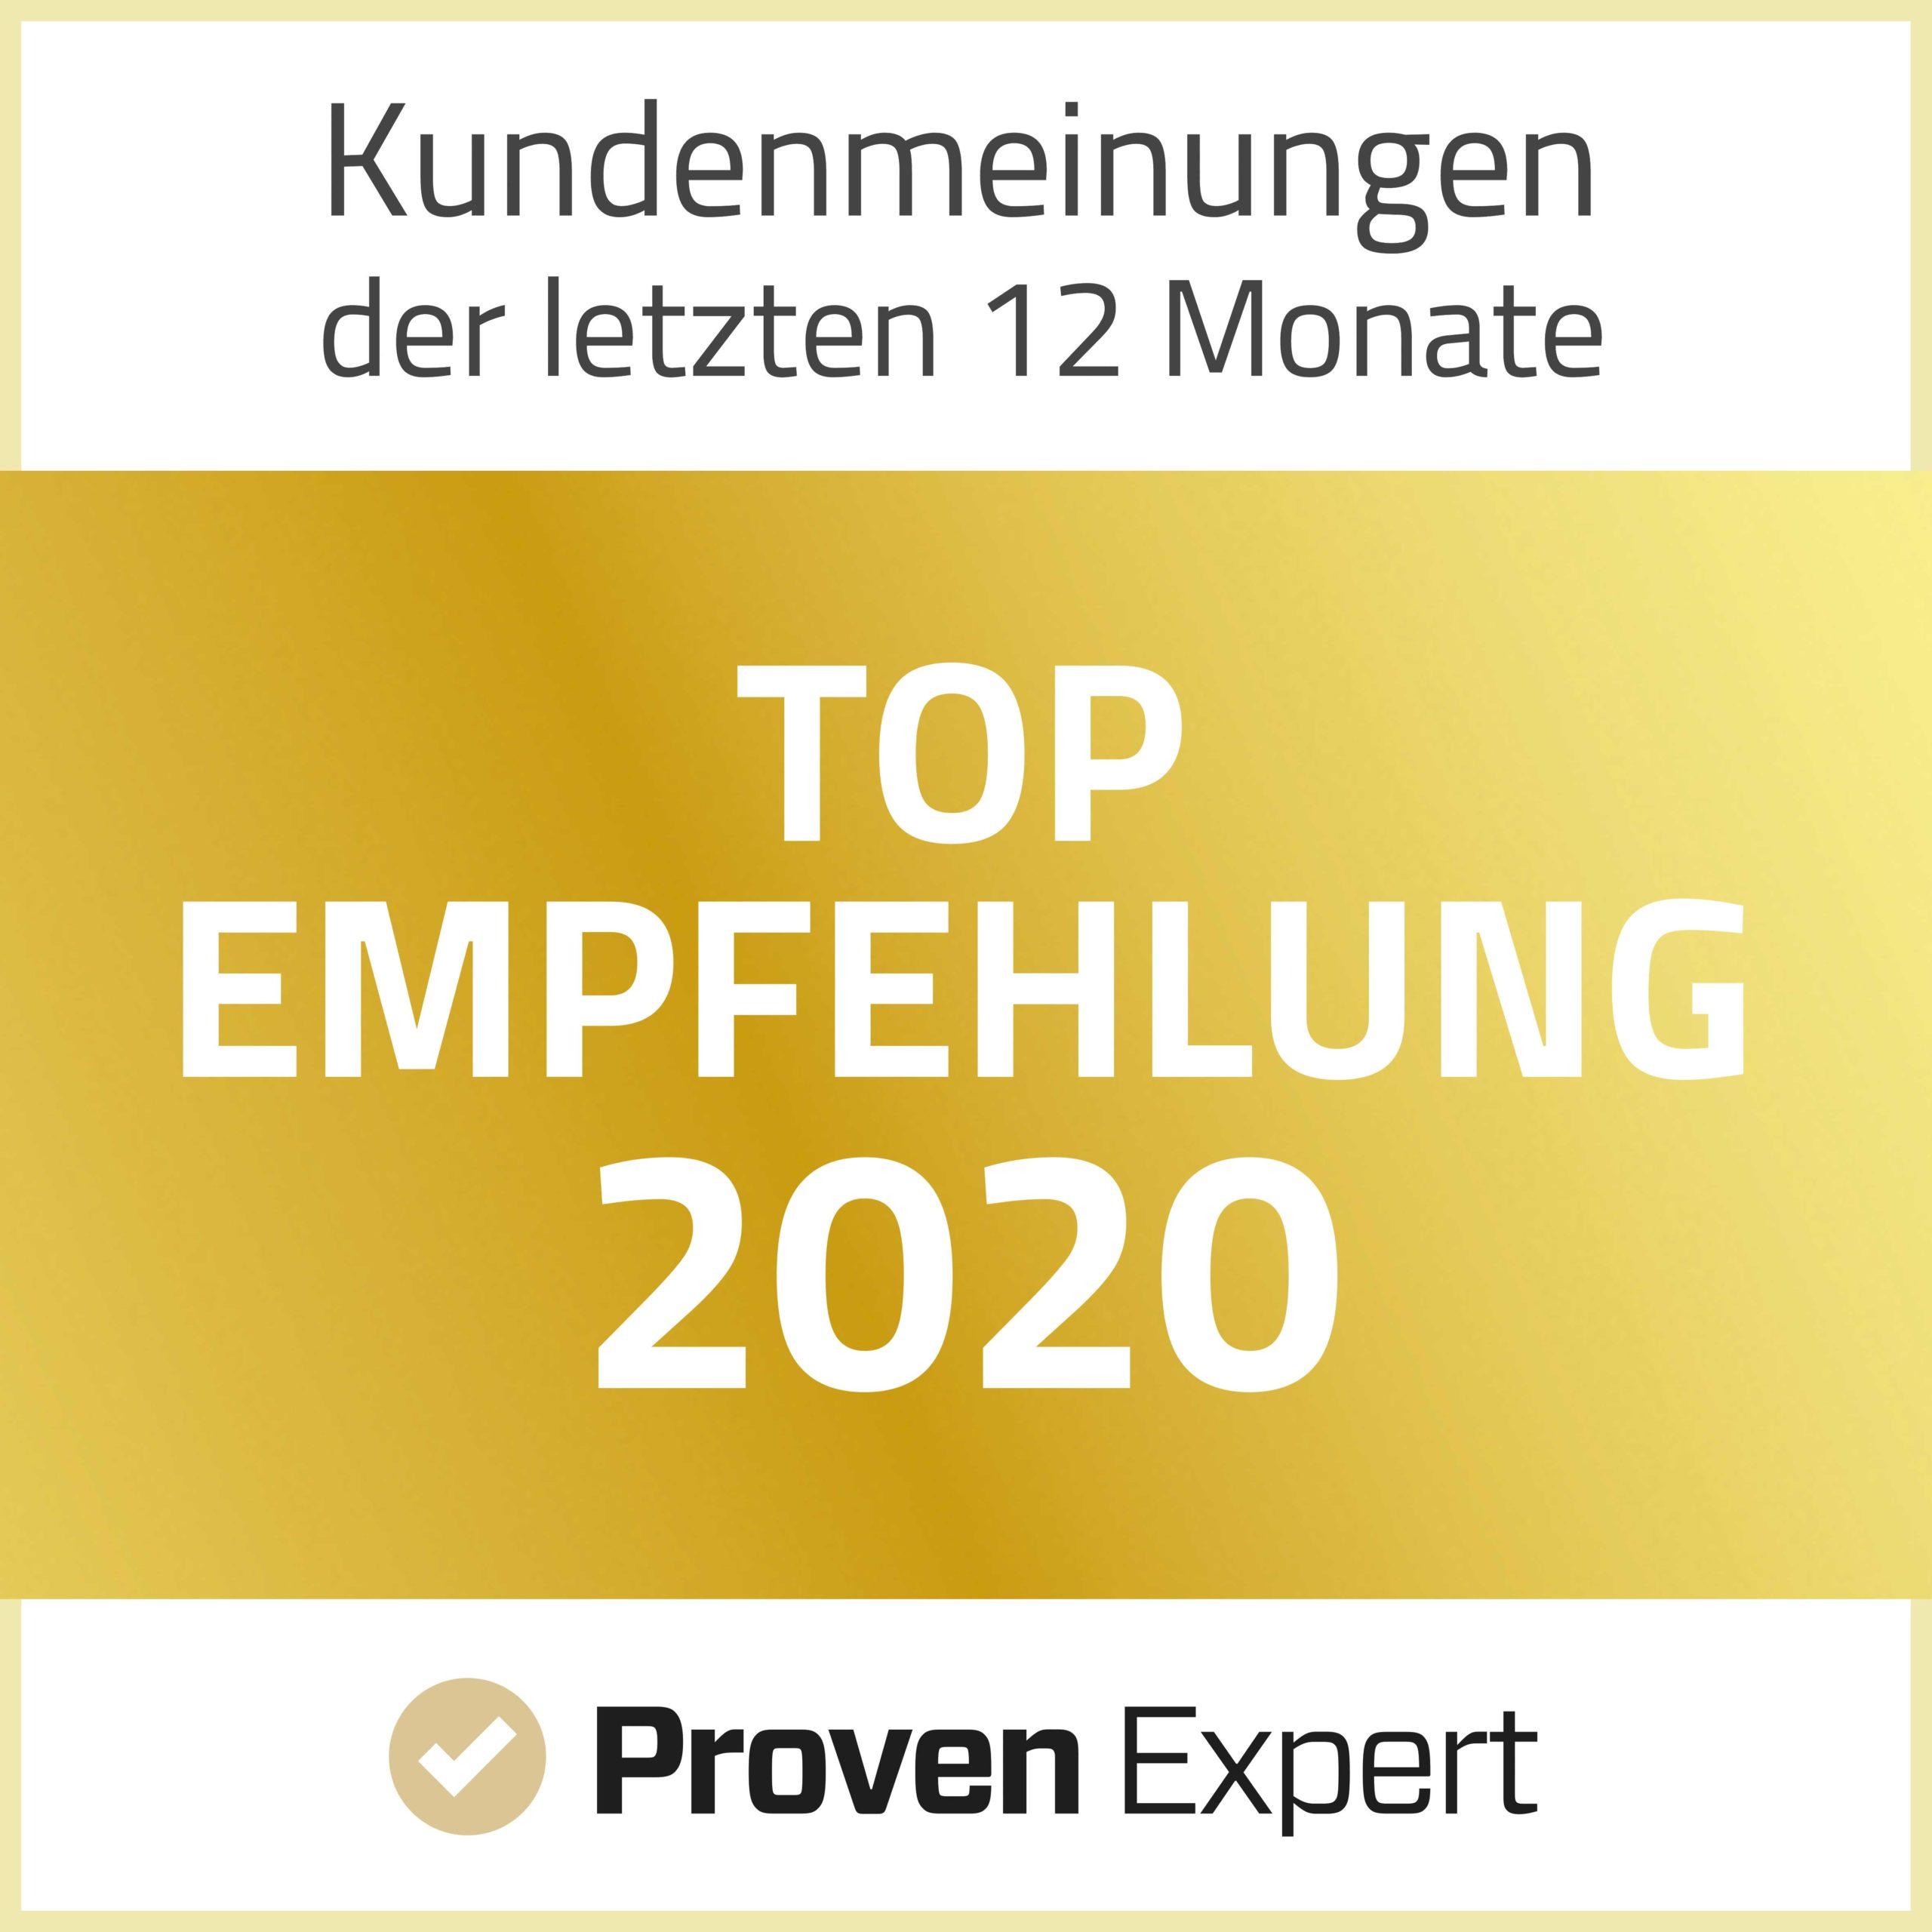 Top Empfehlung Proven Expert.